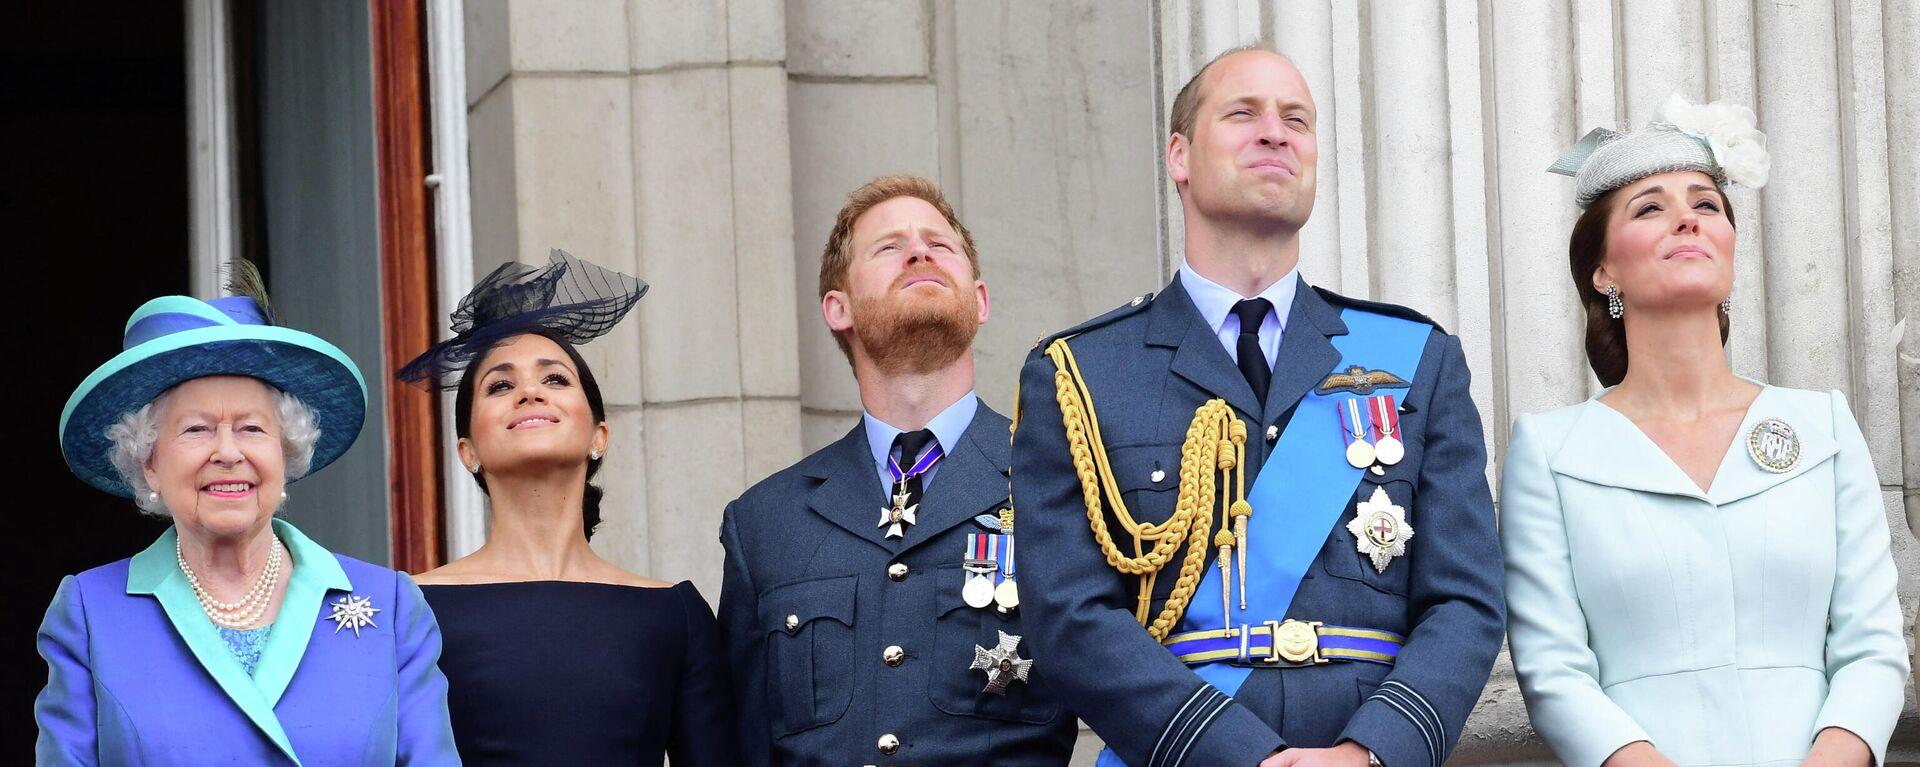 Meghan Markle, junto a la reina Isabel II, el príncipe Harry, el príncipe William y Kate Middleton - Sputnik Mundo, 1920, 03.05.2021